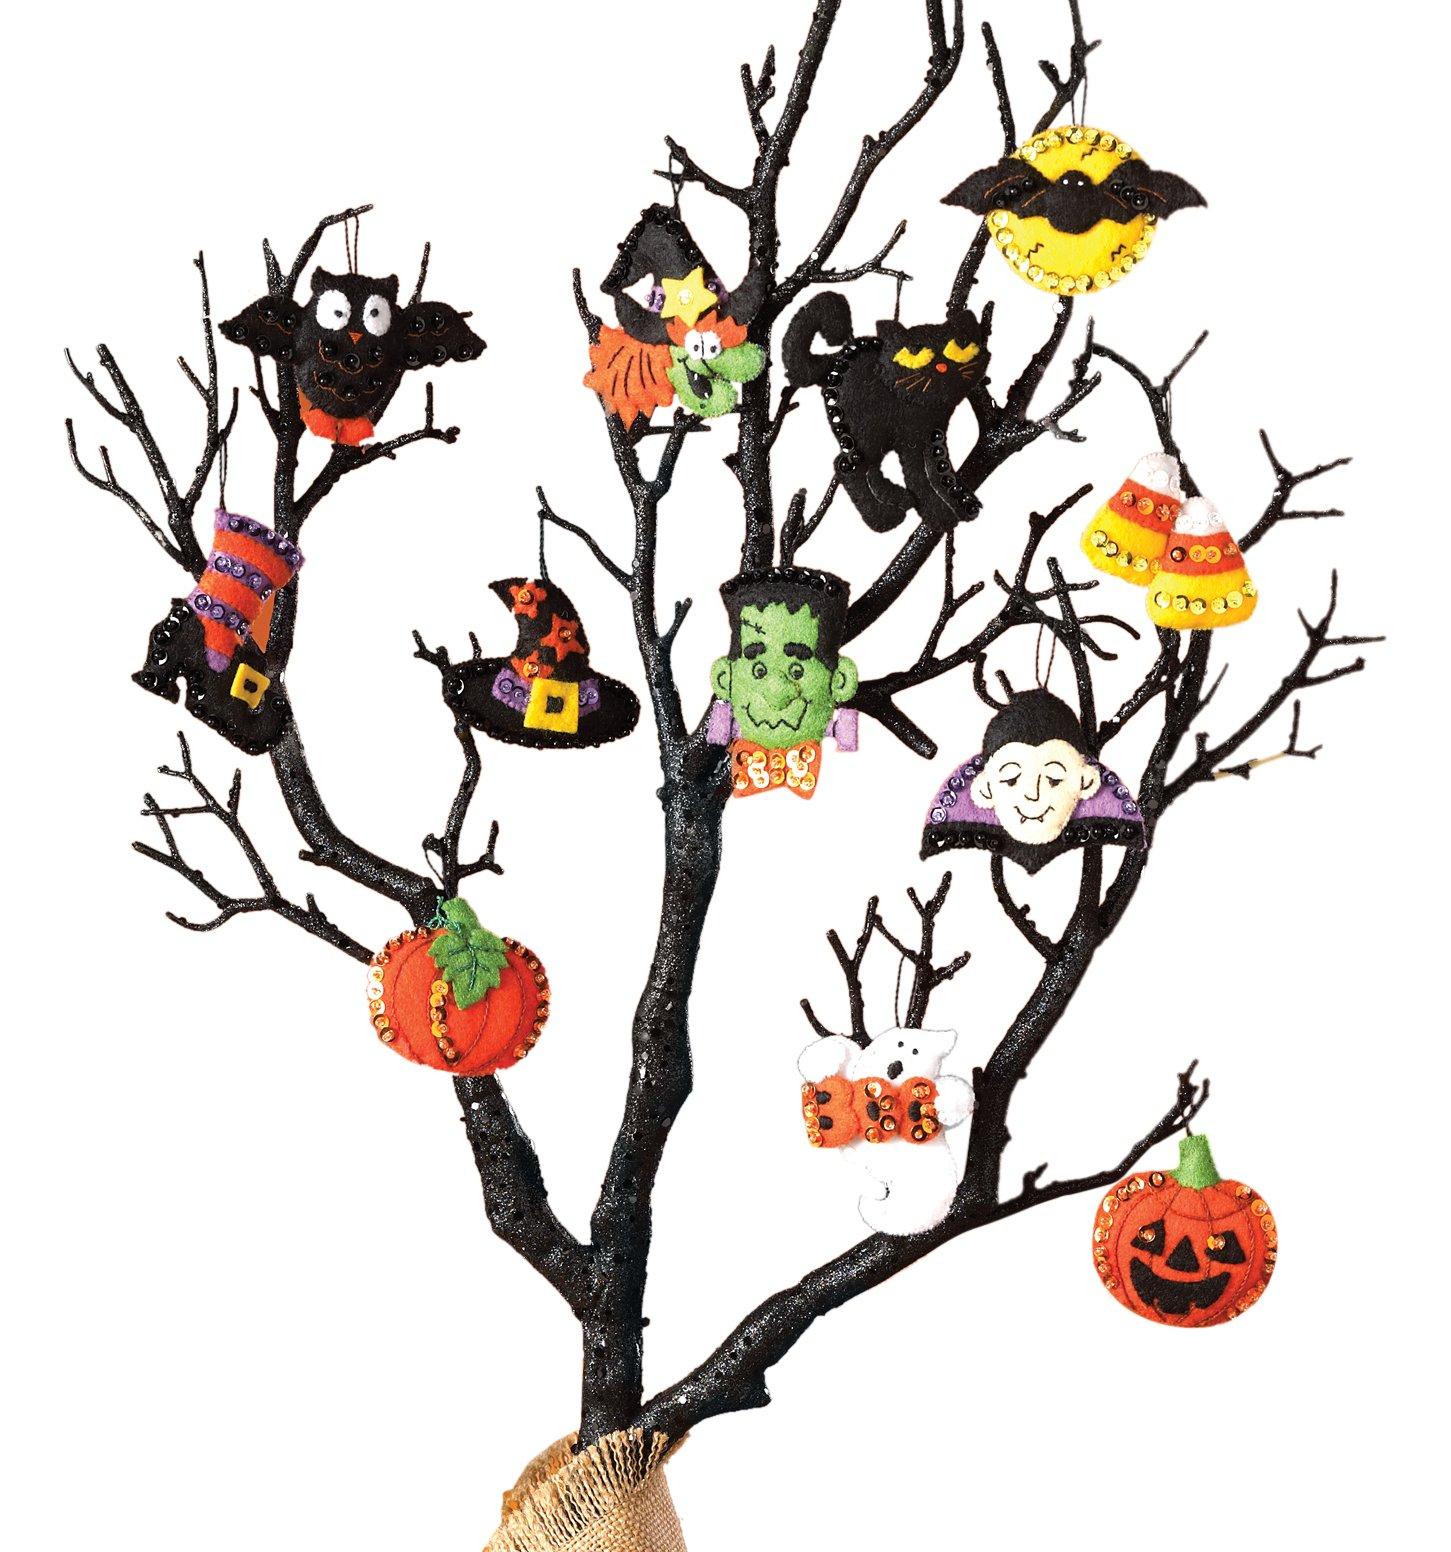 Bucilla Halloween Felt Applique Ornaments Kit (Size 2 2.5-Inch), 86430 Set